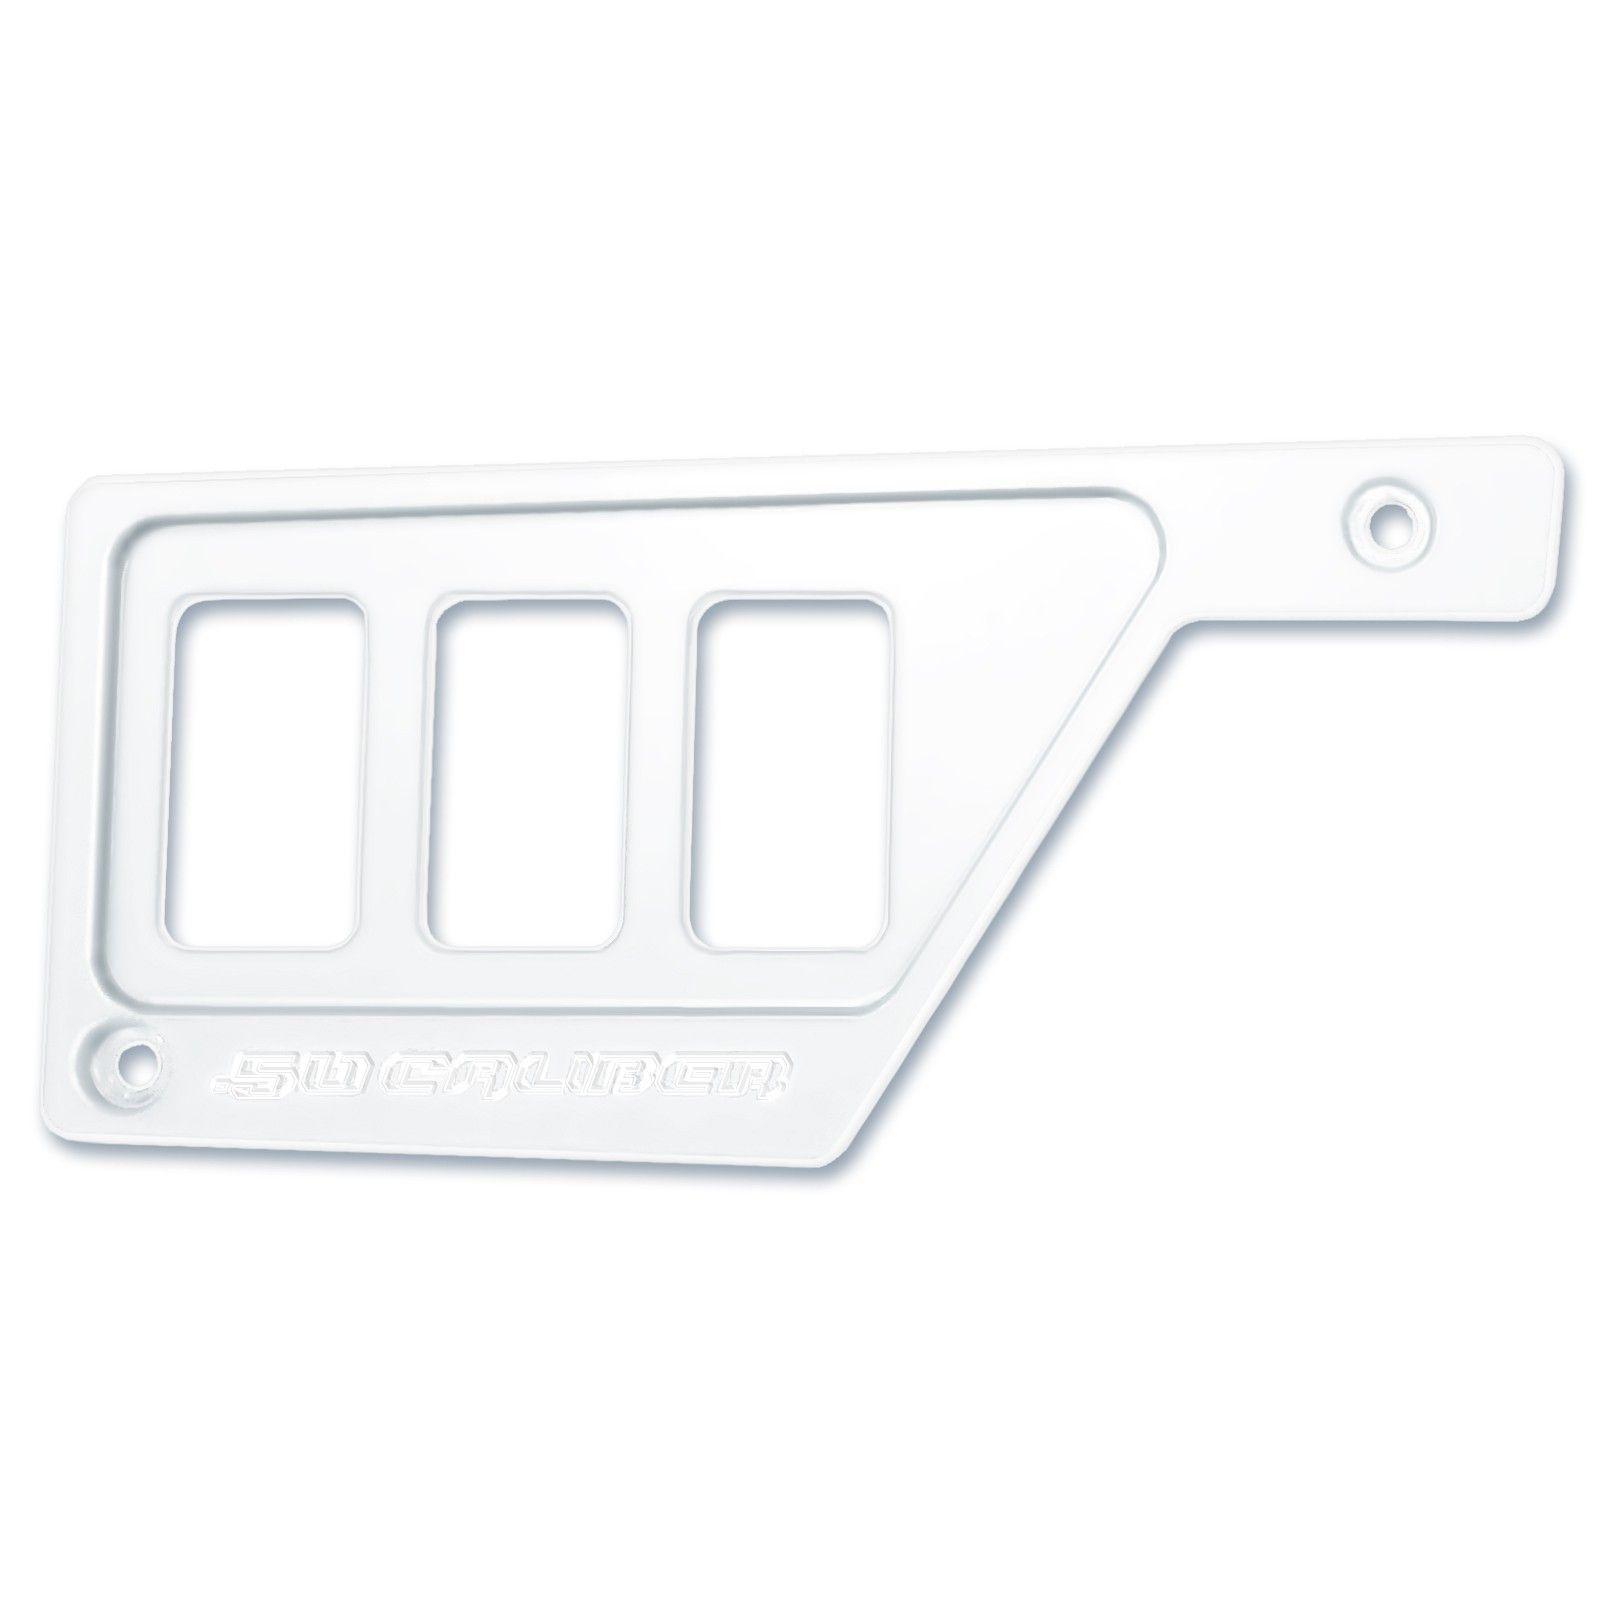 Polaris XP1000 CNC Billet Aluminum Dash panel with powder